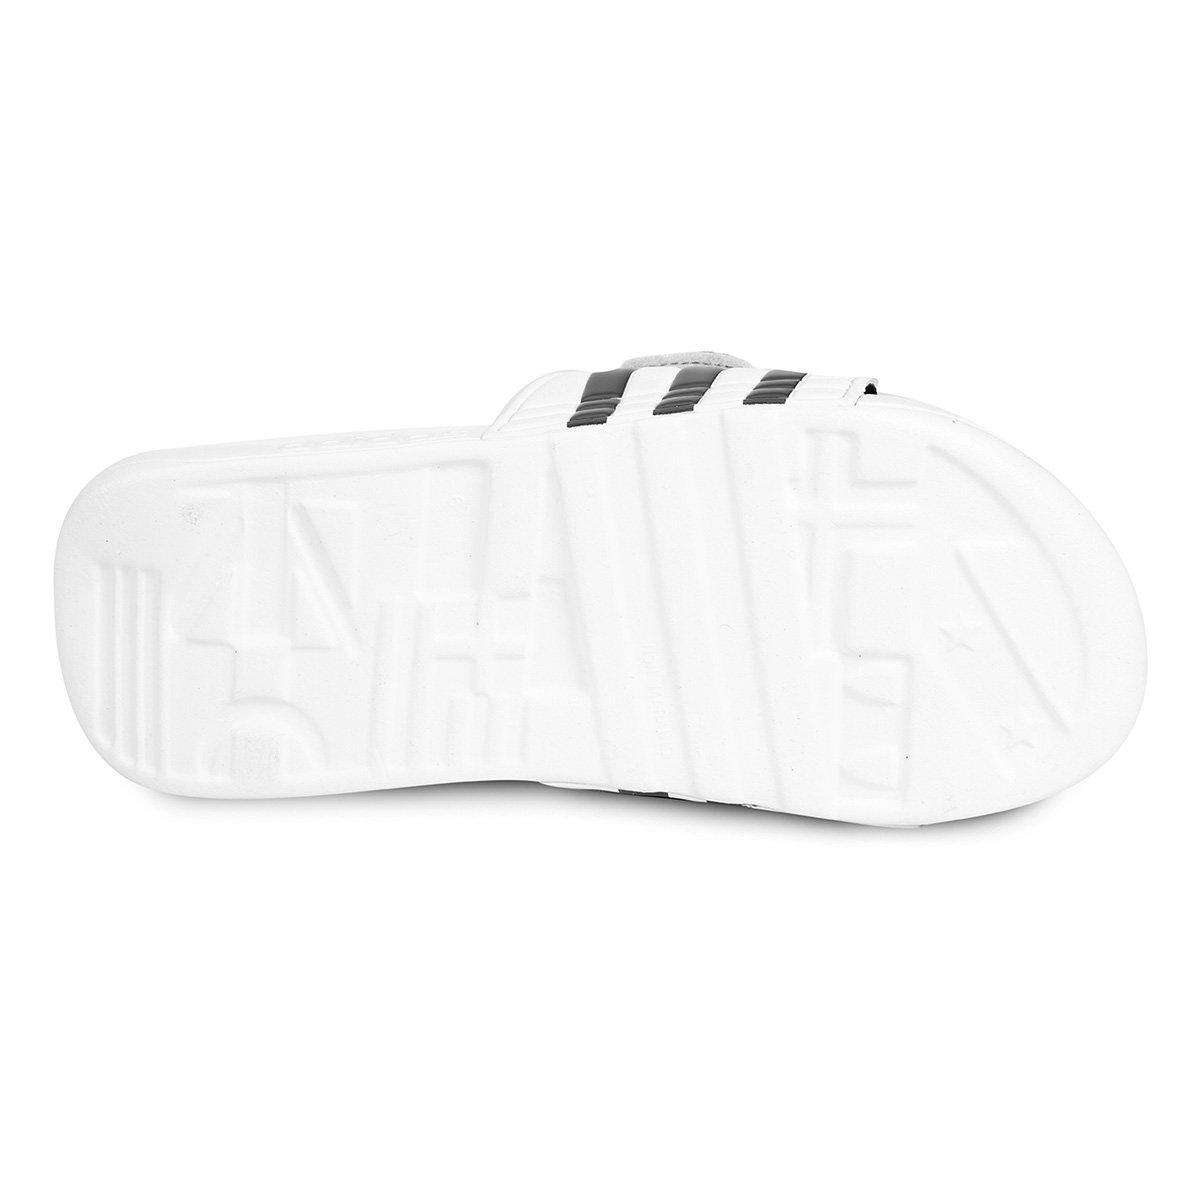 Adissage Adidas Branco Adidas Chinelo Chinelo Cinza e Branco Adissage nTFqgg